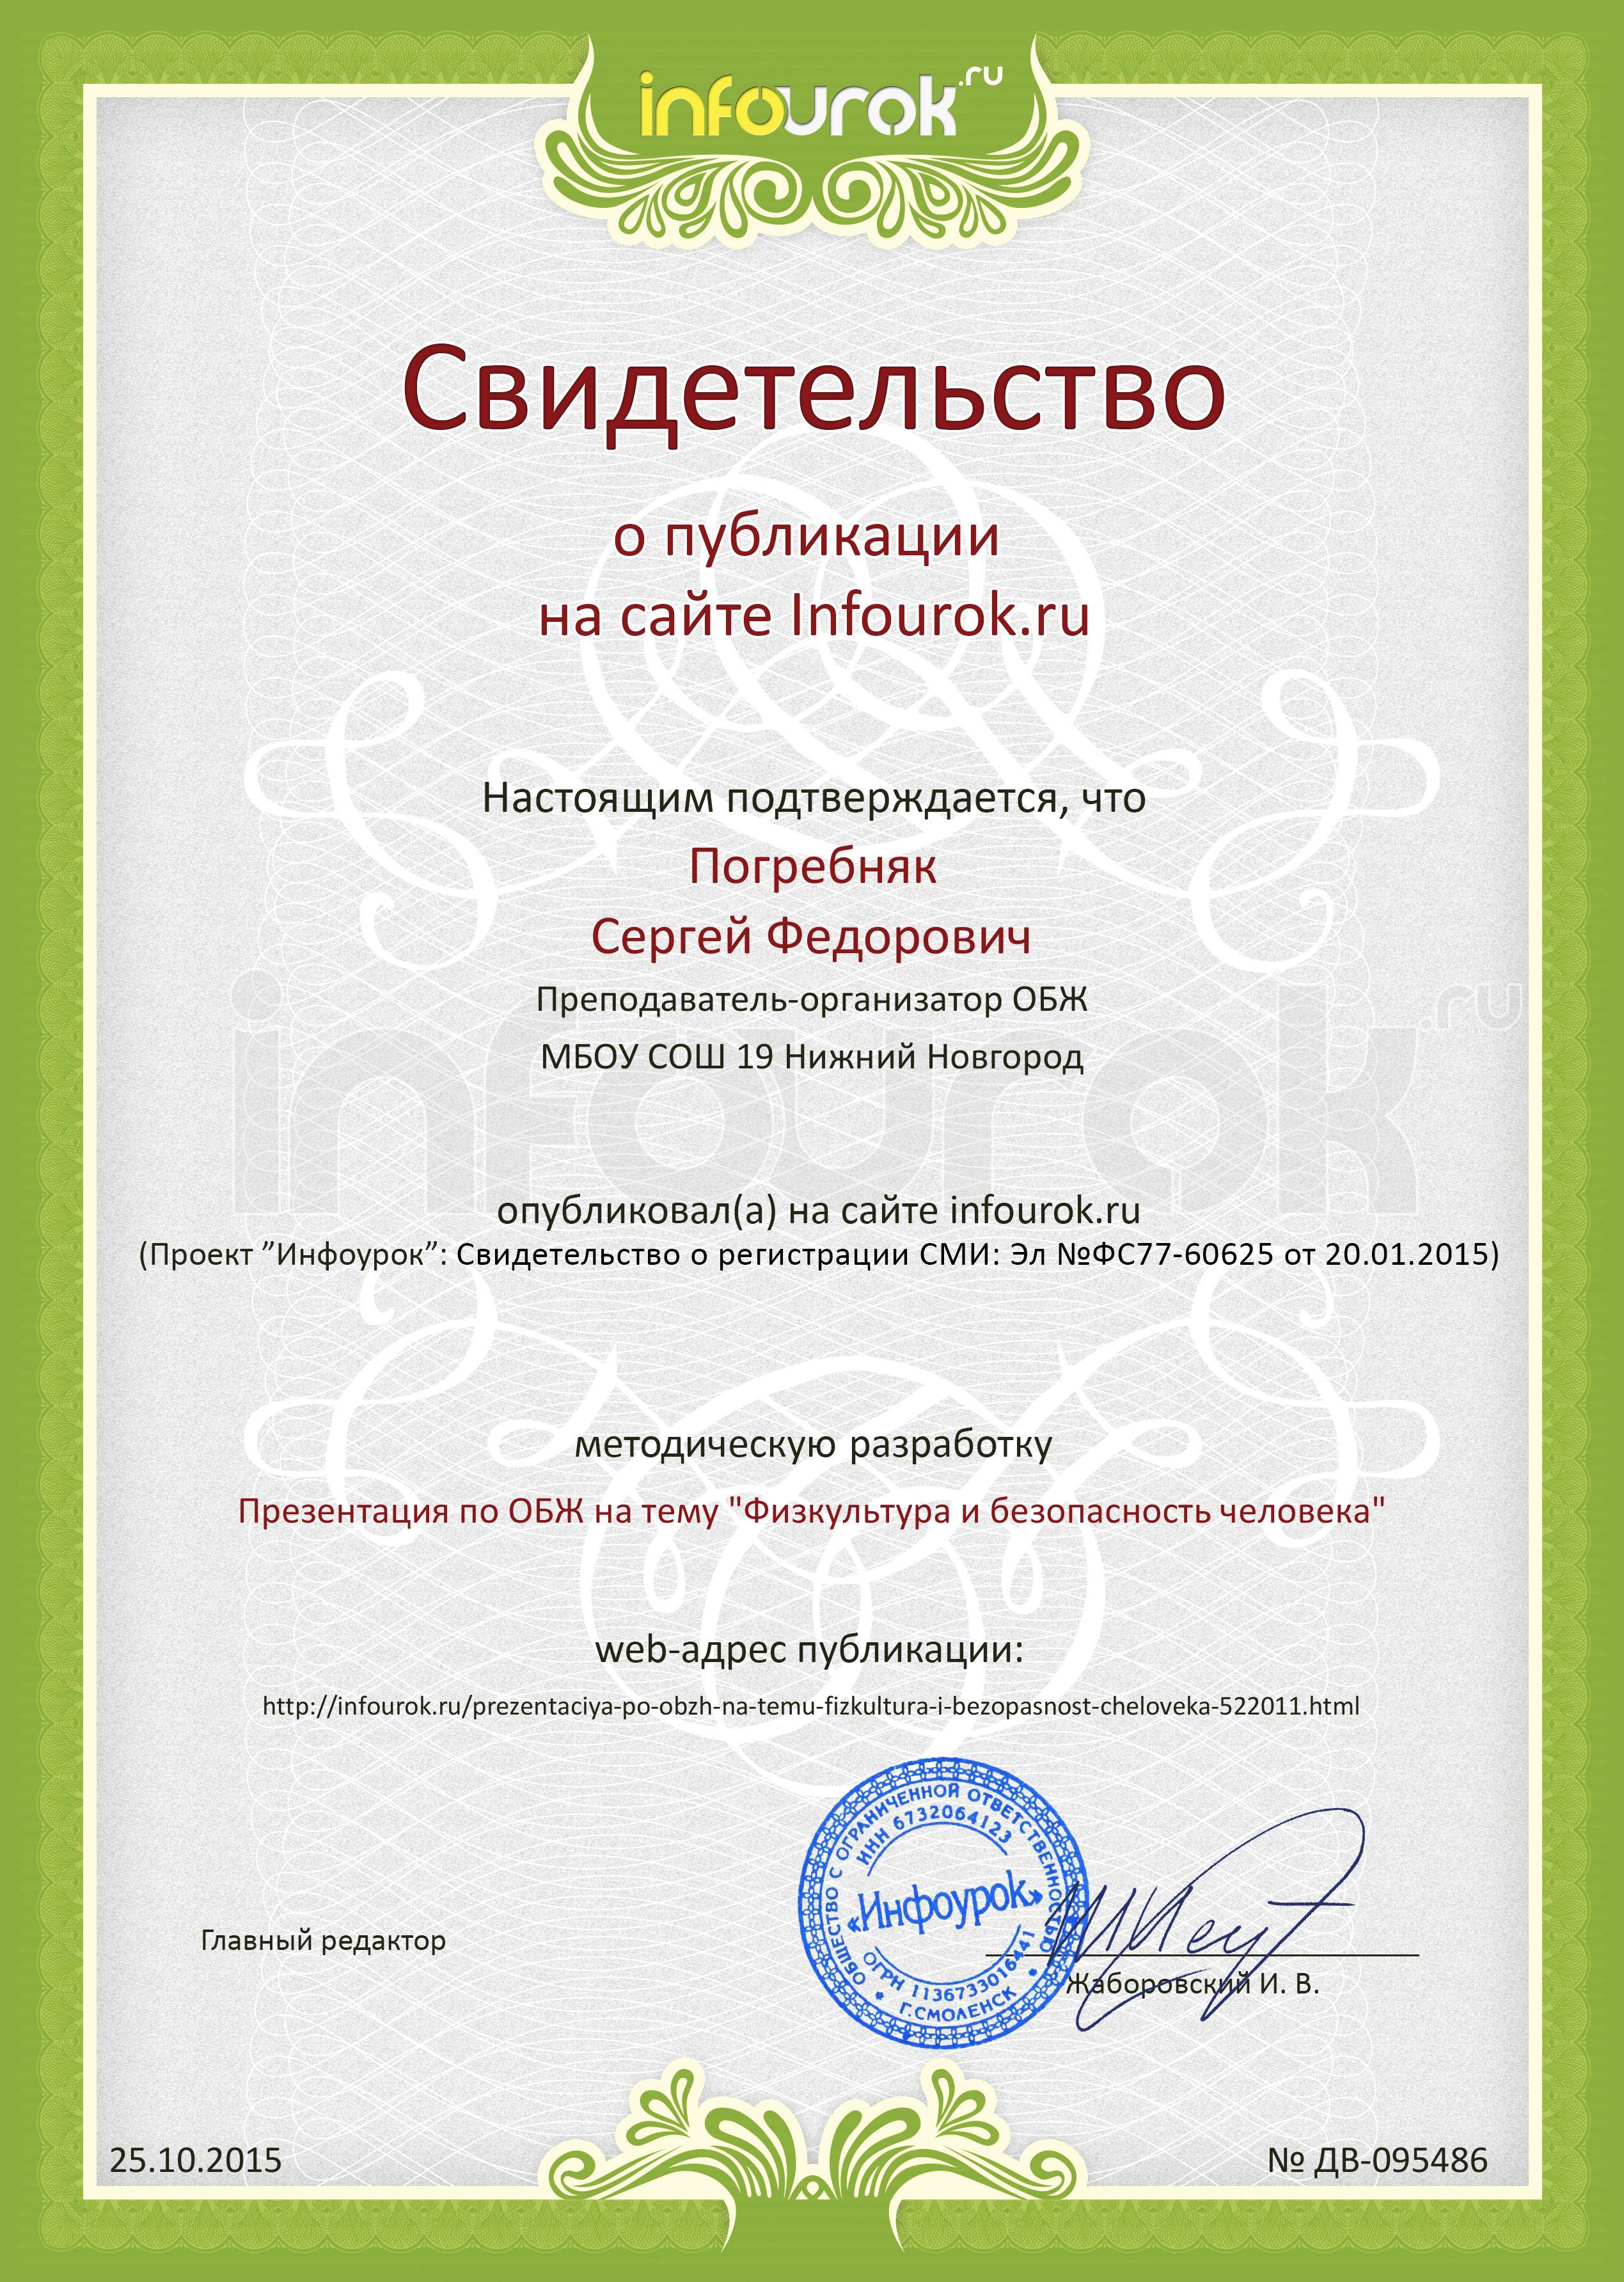 Сертификат проекта infourok.ru № ДВ-095486.jpg